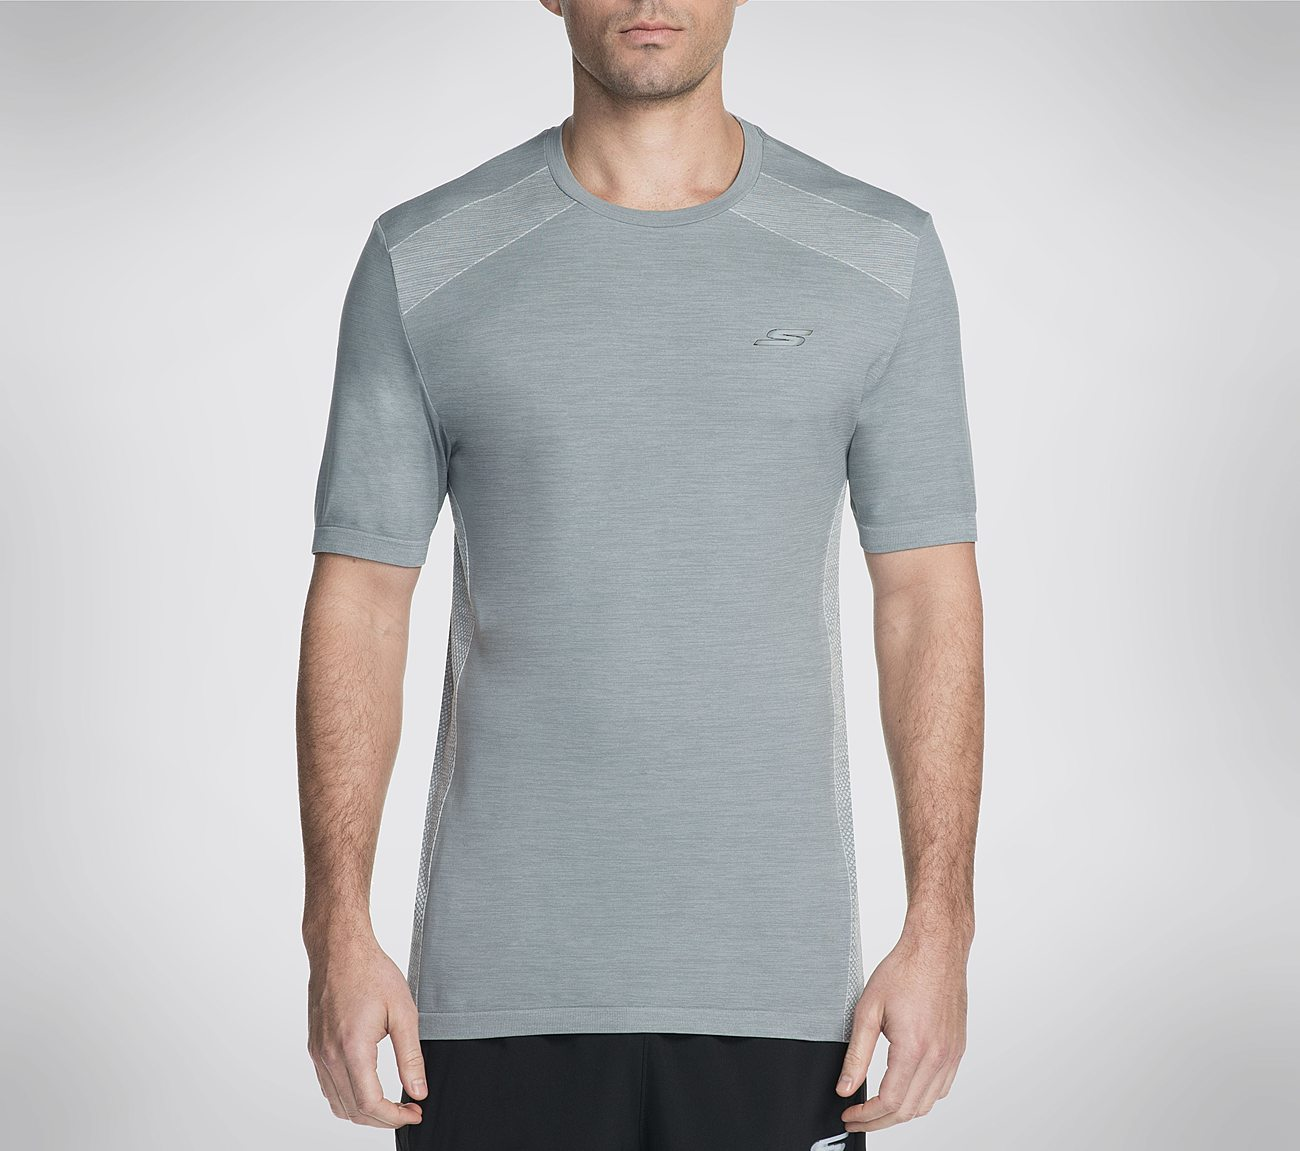 Knit Seamless Tee Shirt Tee Shirts Shoes